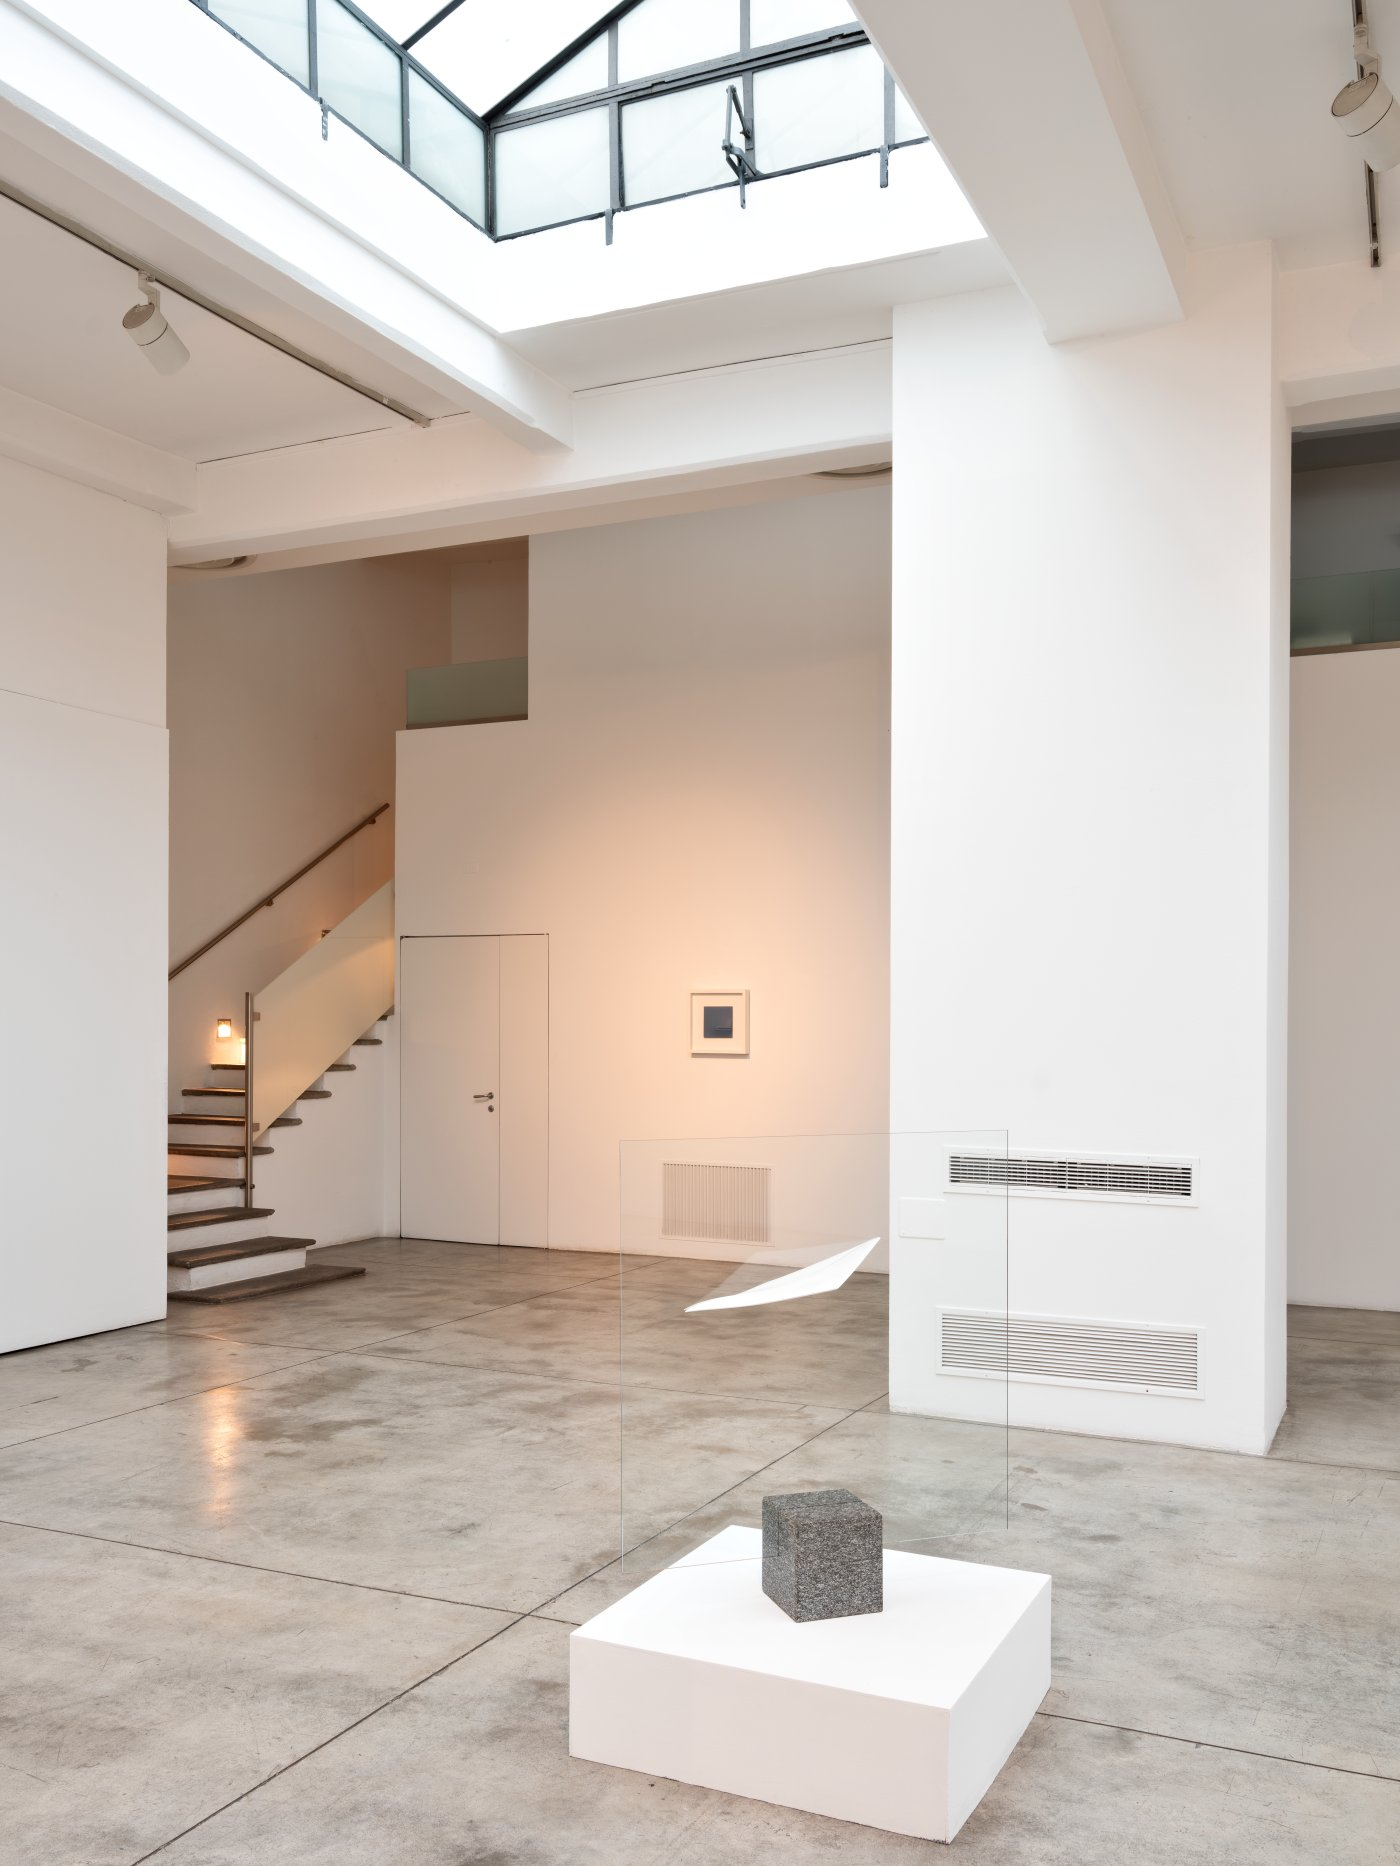 Cardi Gallery Milan Agostino Bonalumi 4